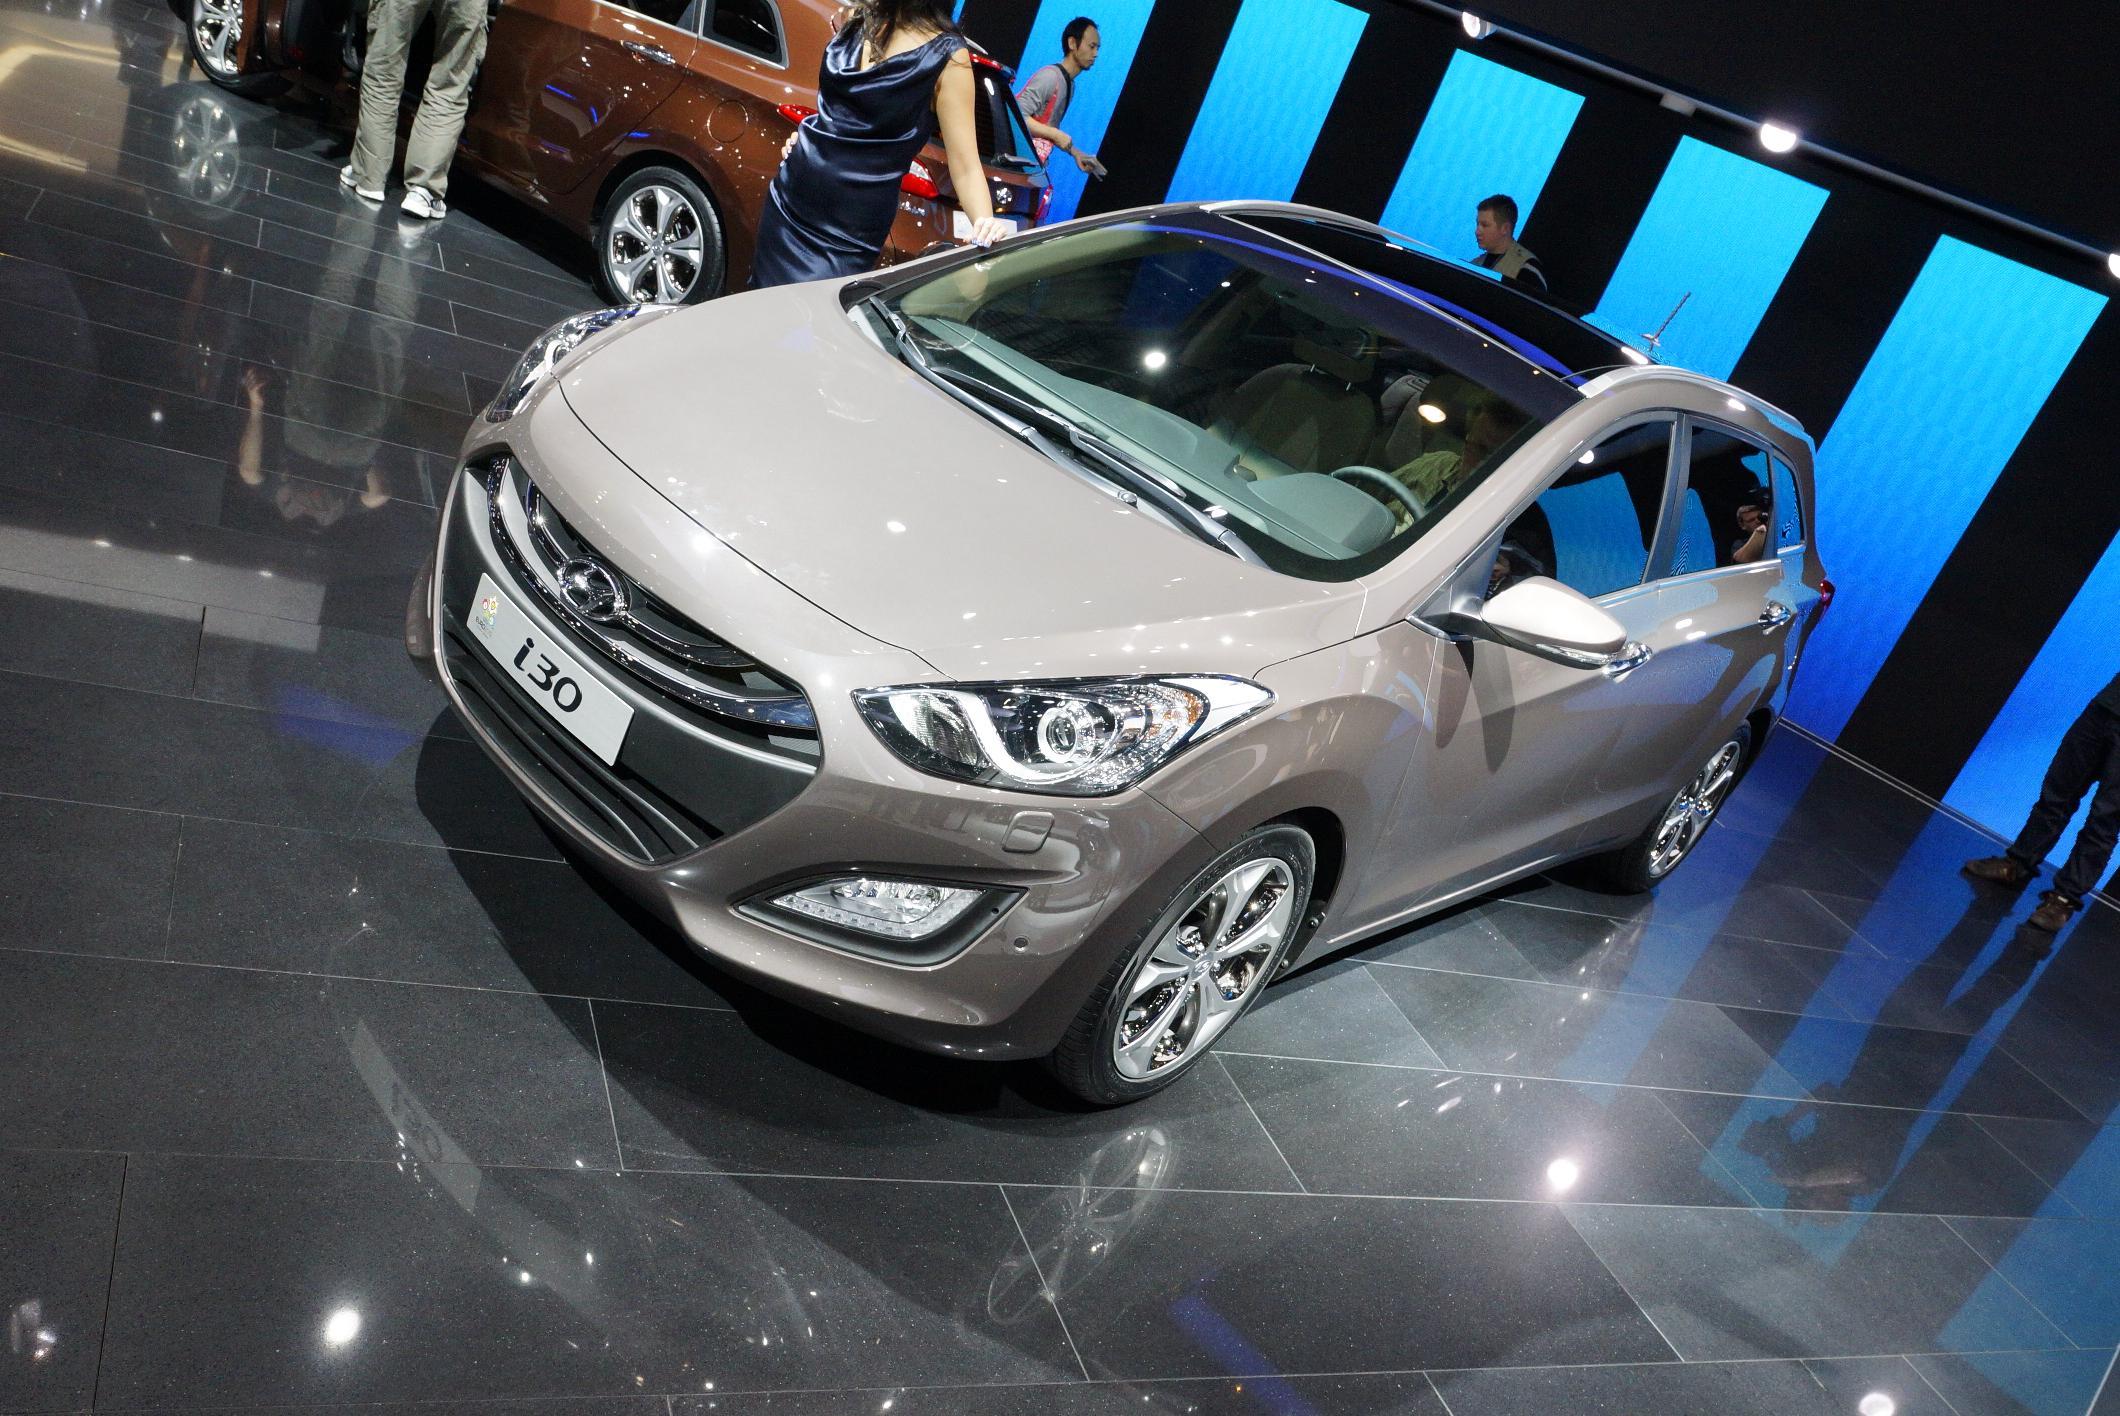 Hyundai i30 Geneva 2012